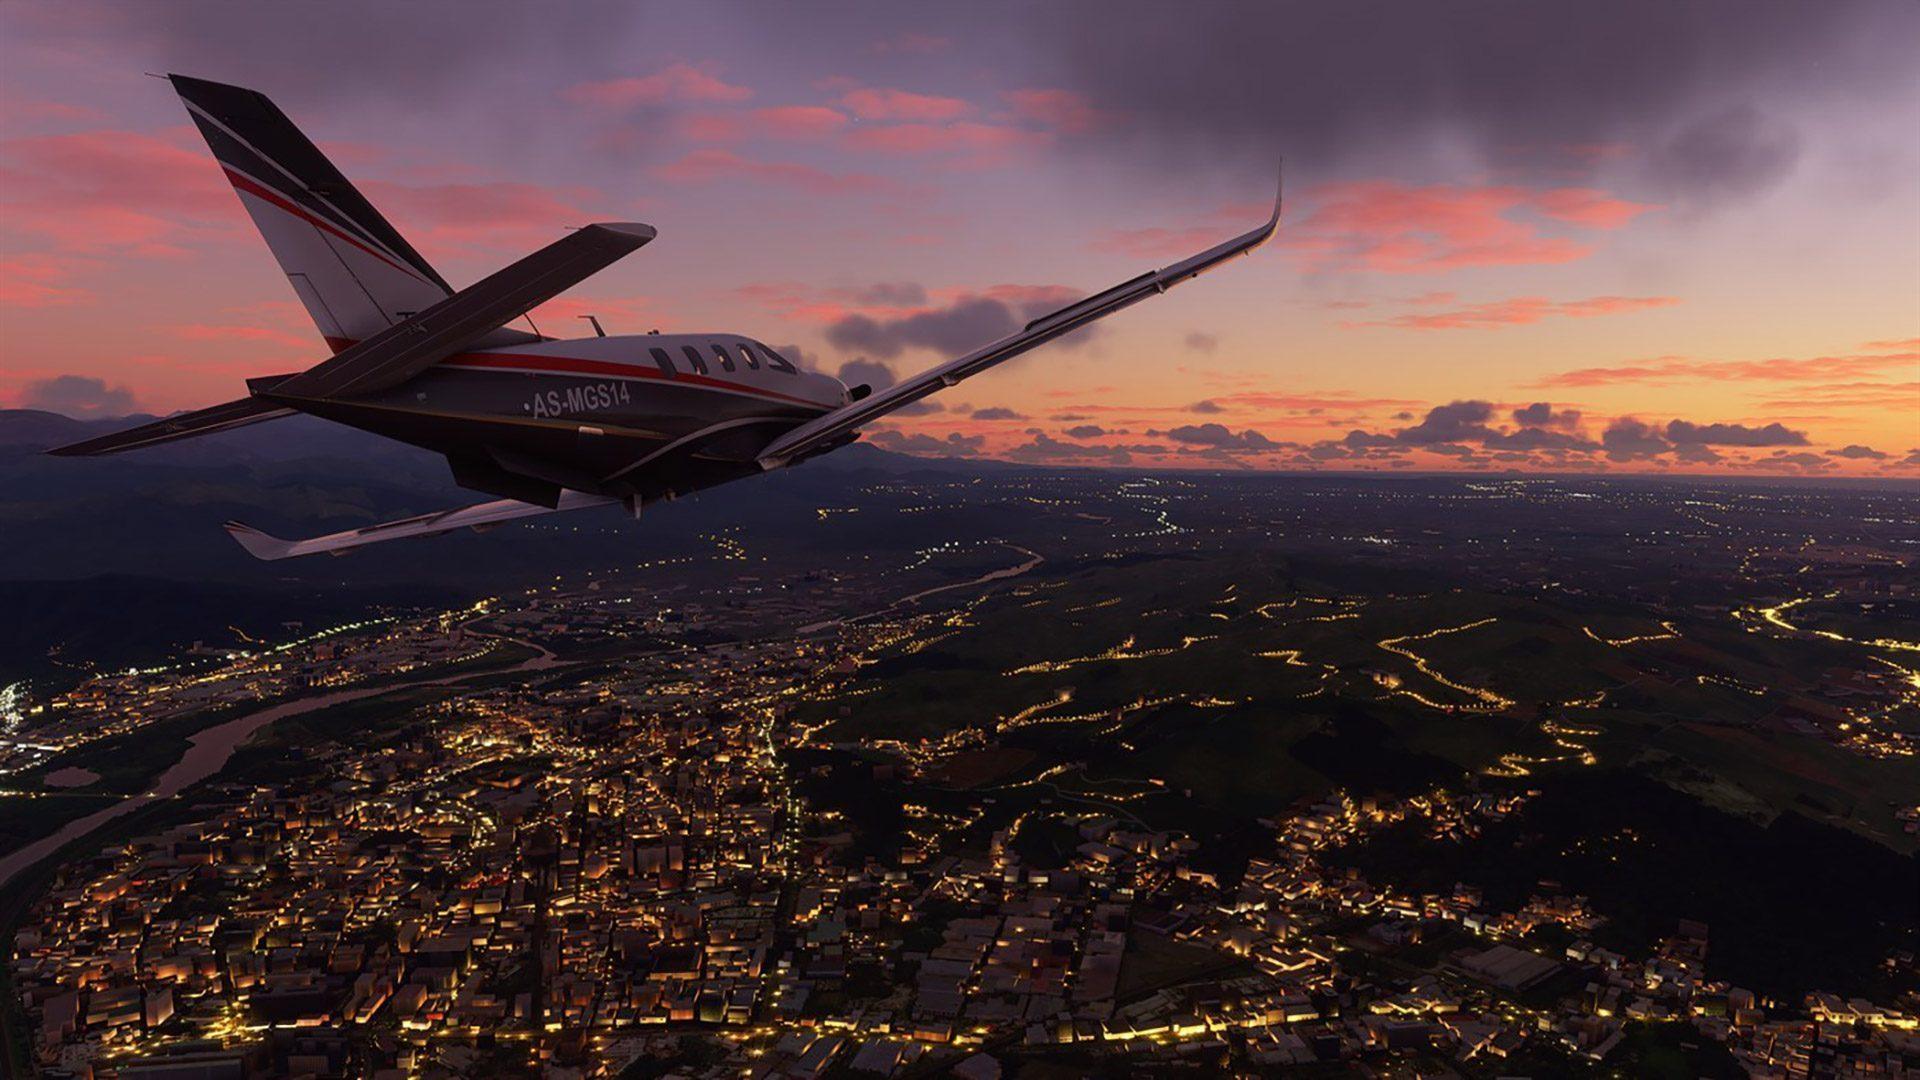 flightsim_screen3